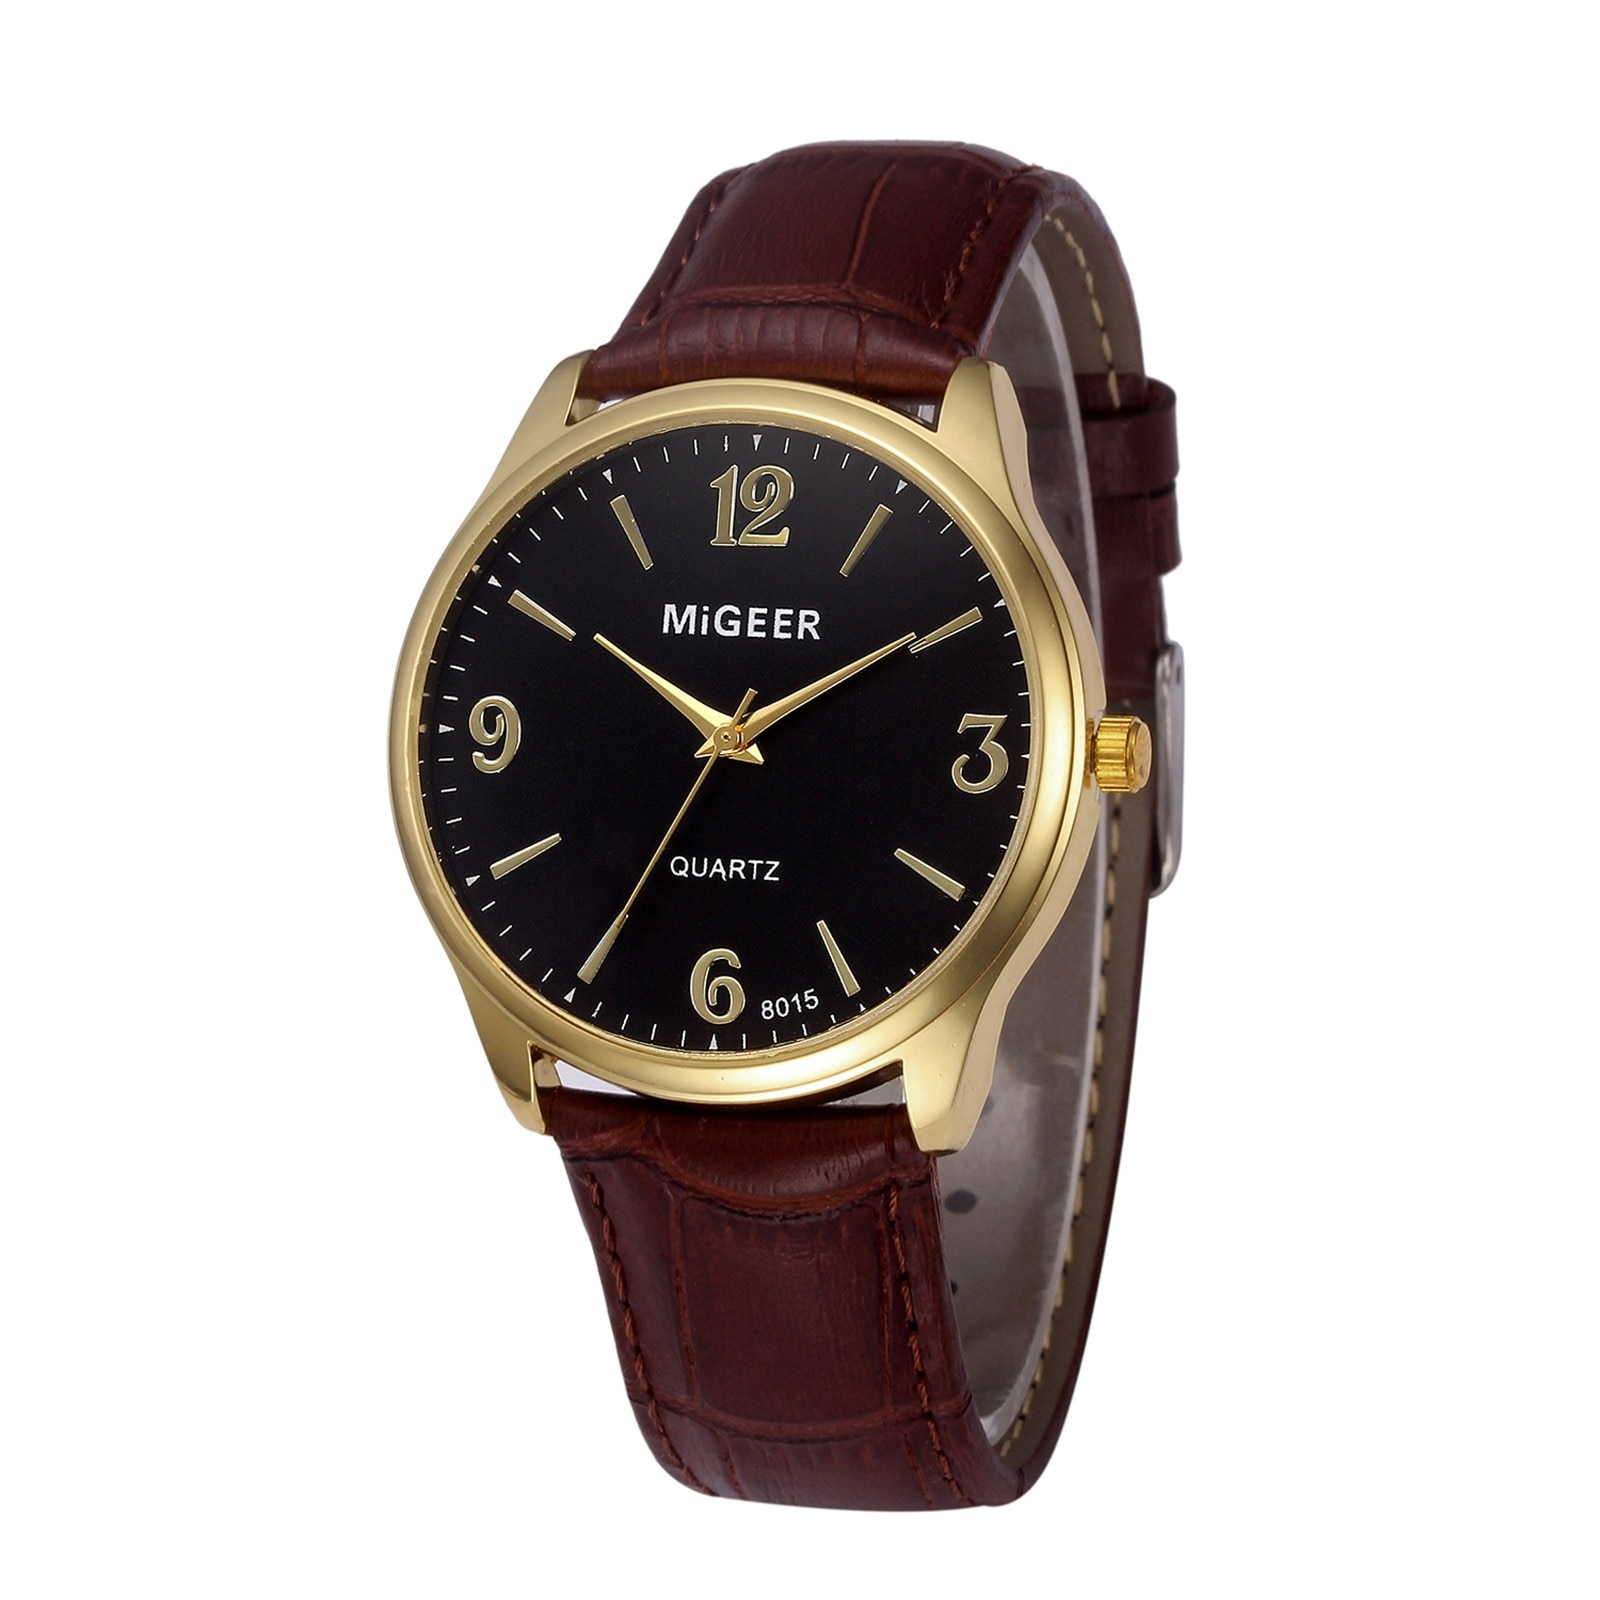 Sleek Minimalist Watches For Men Women New Arrival Unisex Watch Quartz Clock Leather Strap Quartz Wristwatch Gift Montre Homme